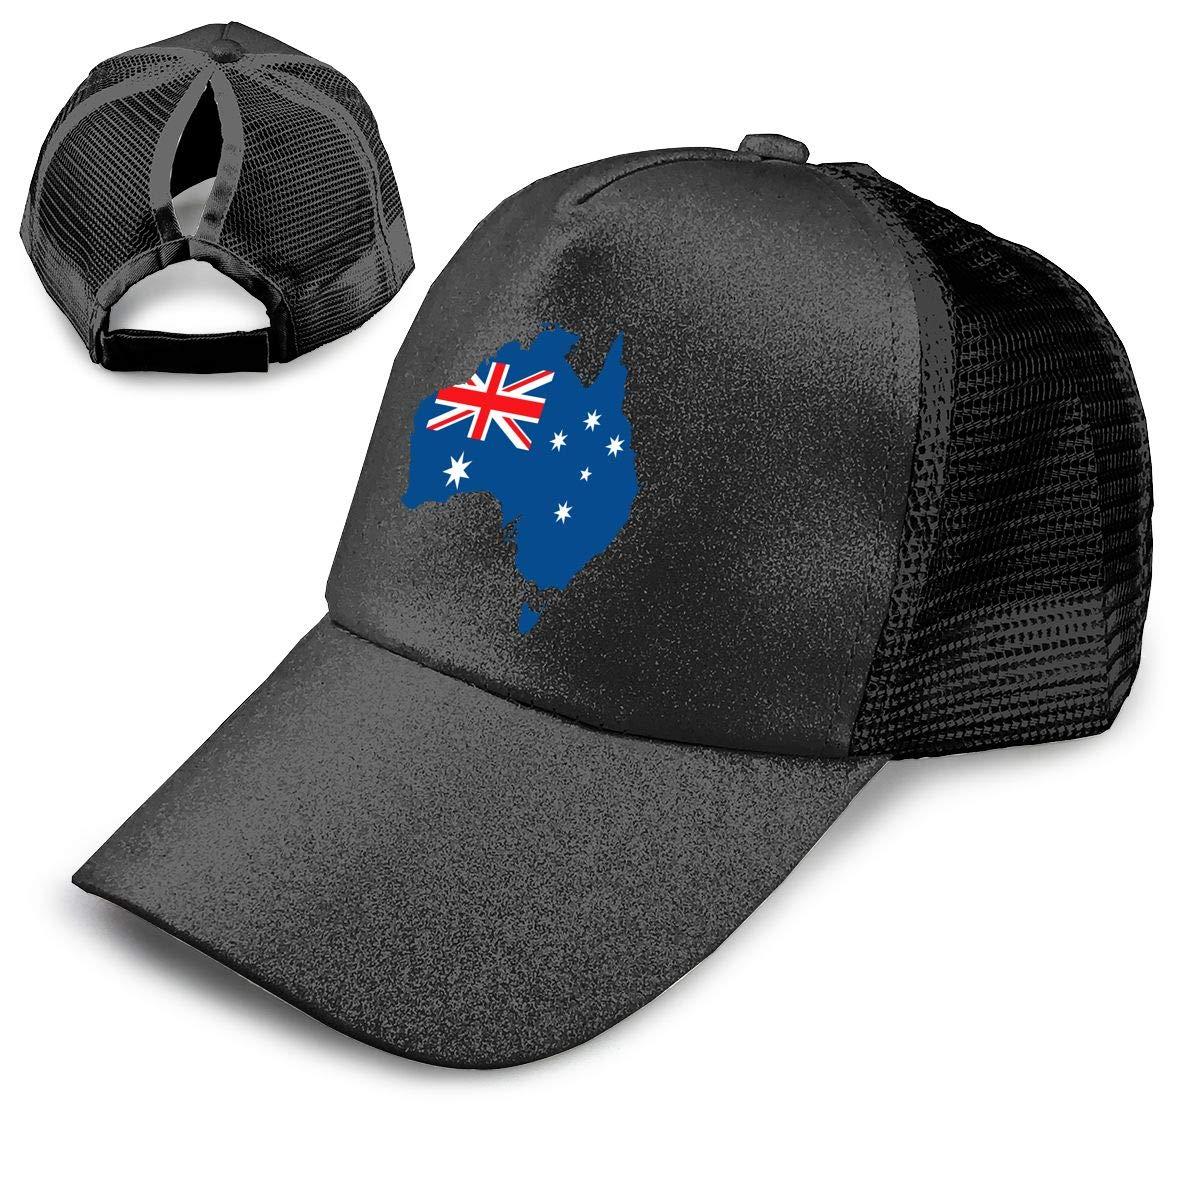 7daffac82 Amazon.com: Australia Pride Ponytail Hats for Women Messy Trucker ...